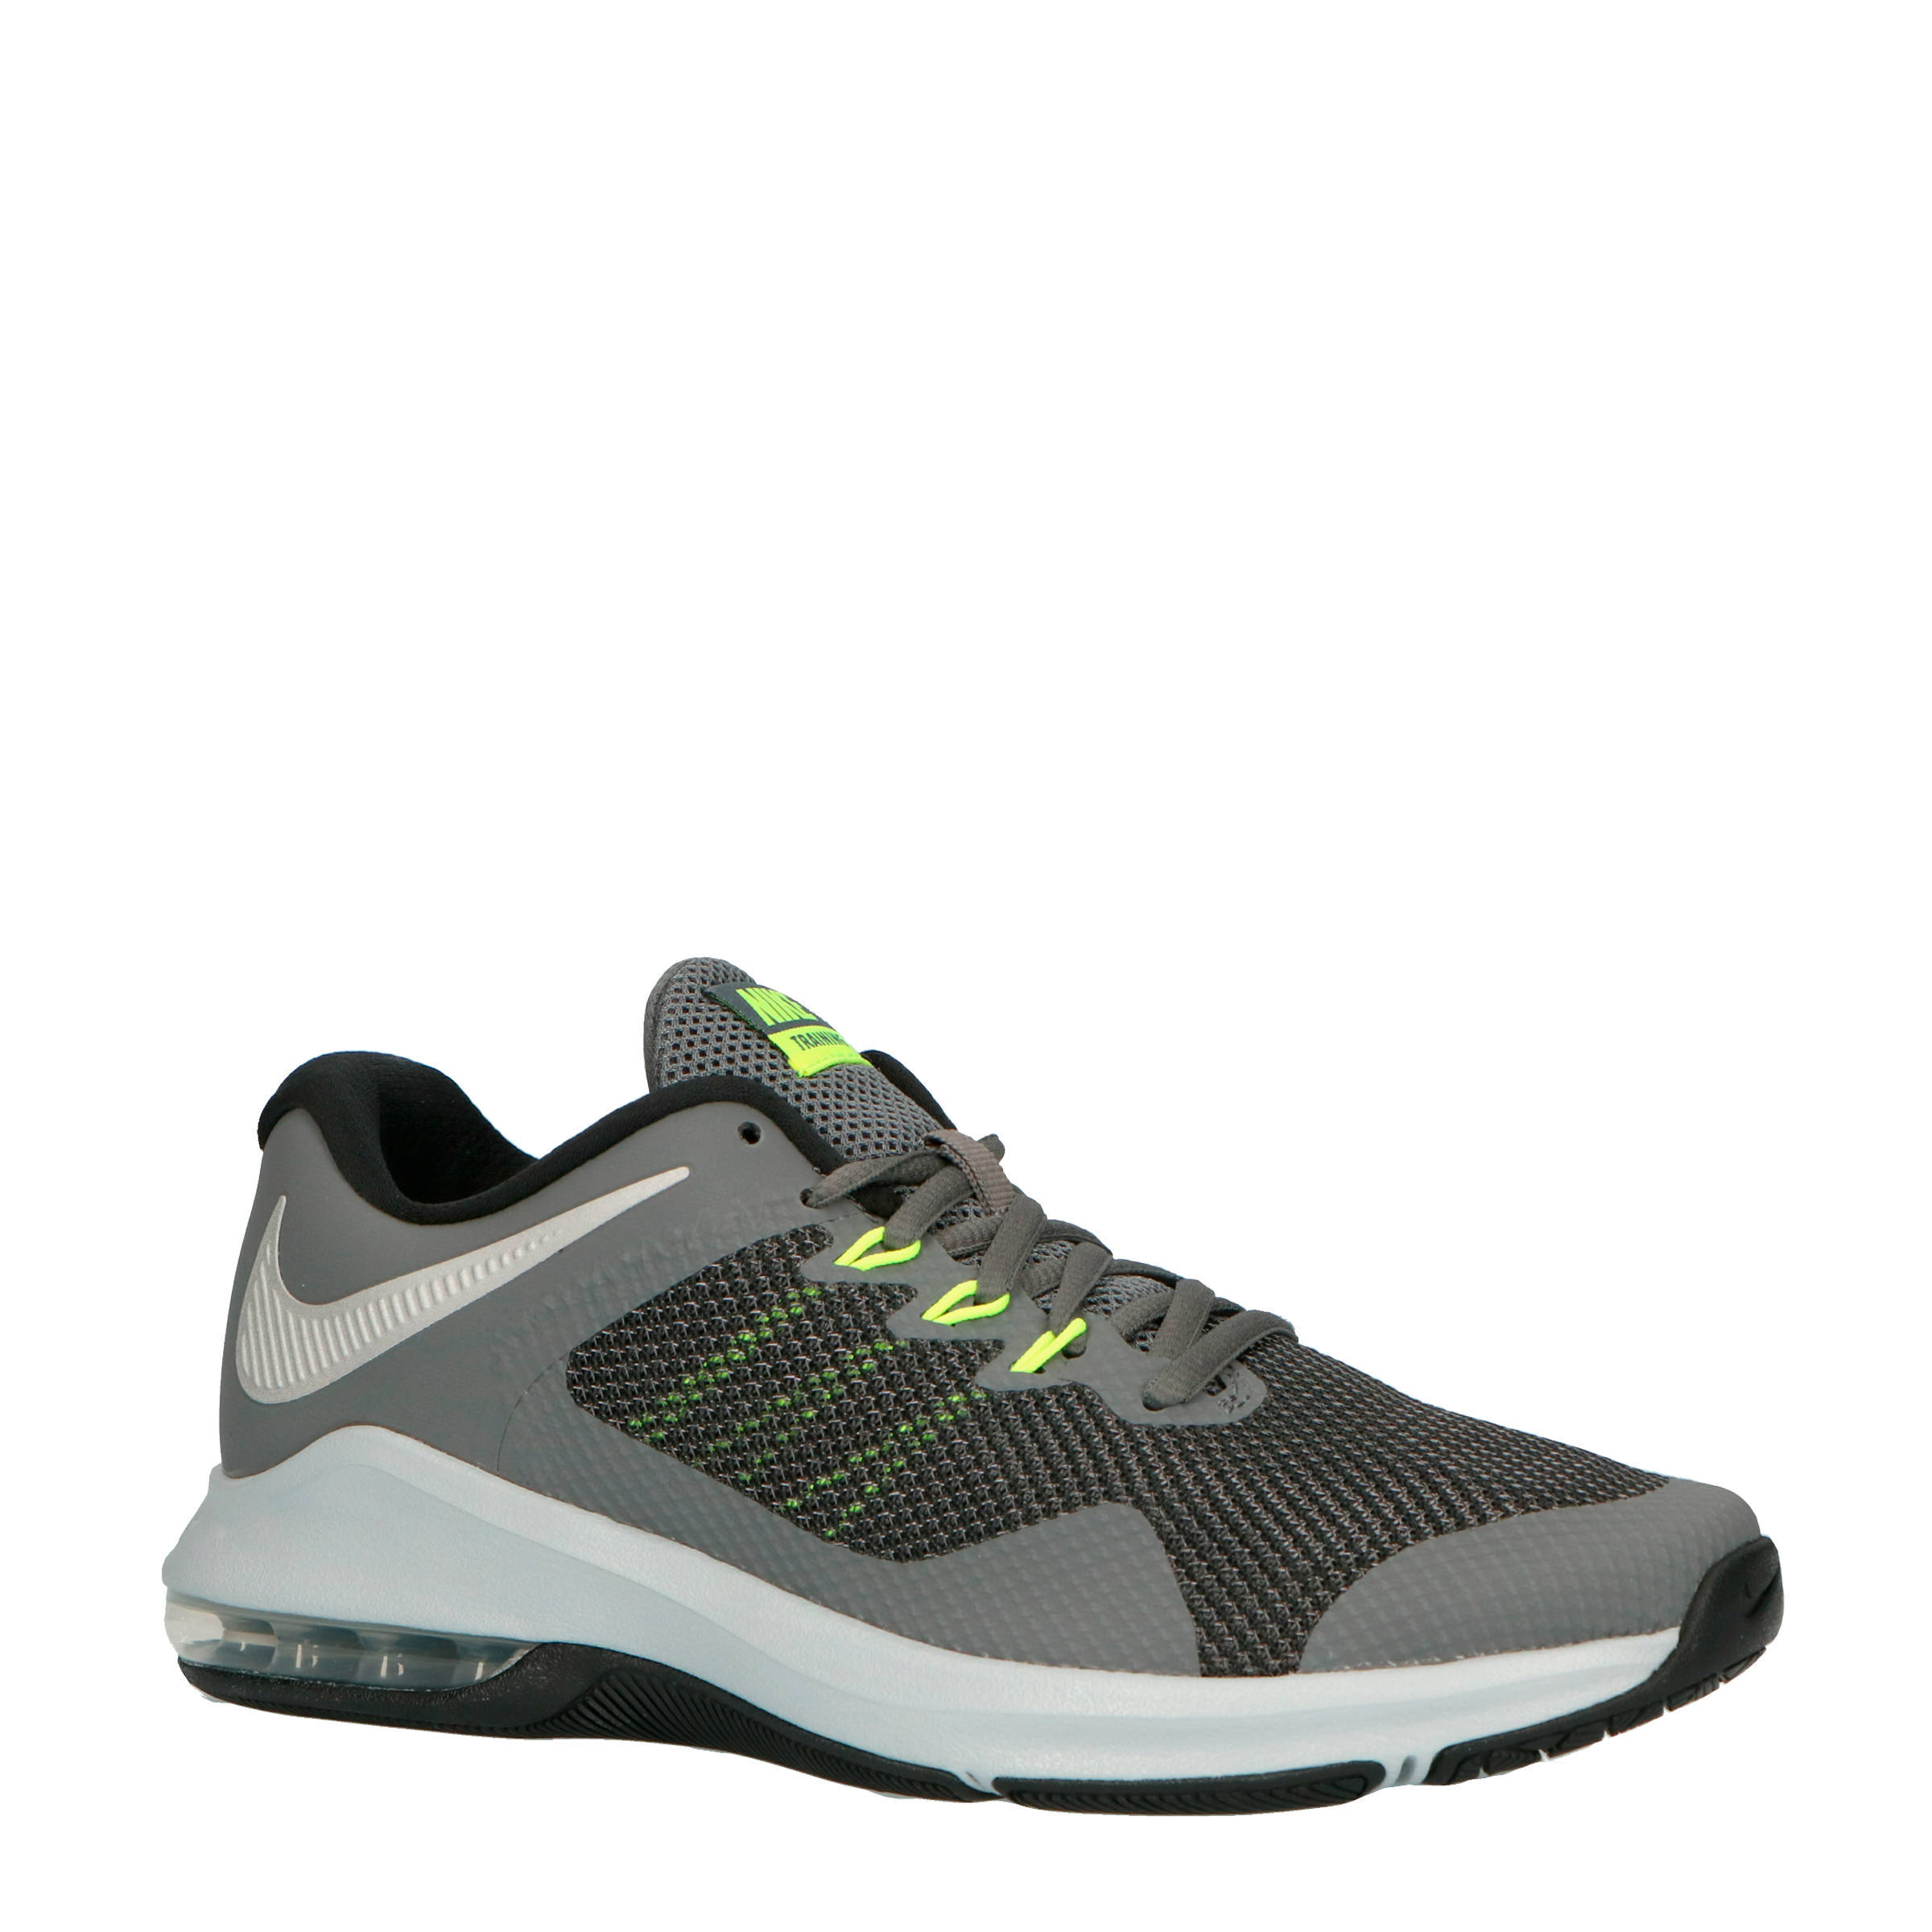 online store 65a44 49d02 Air Nike Trainer Fitness SchoenenWehkamp Max Alpha fYgyb76